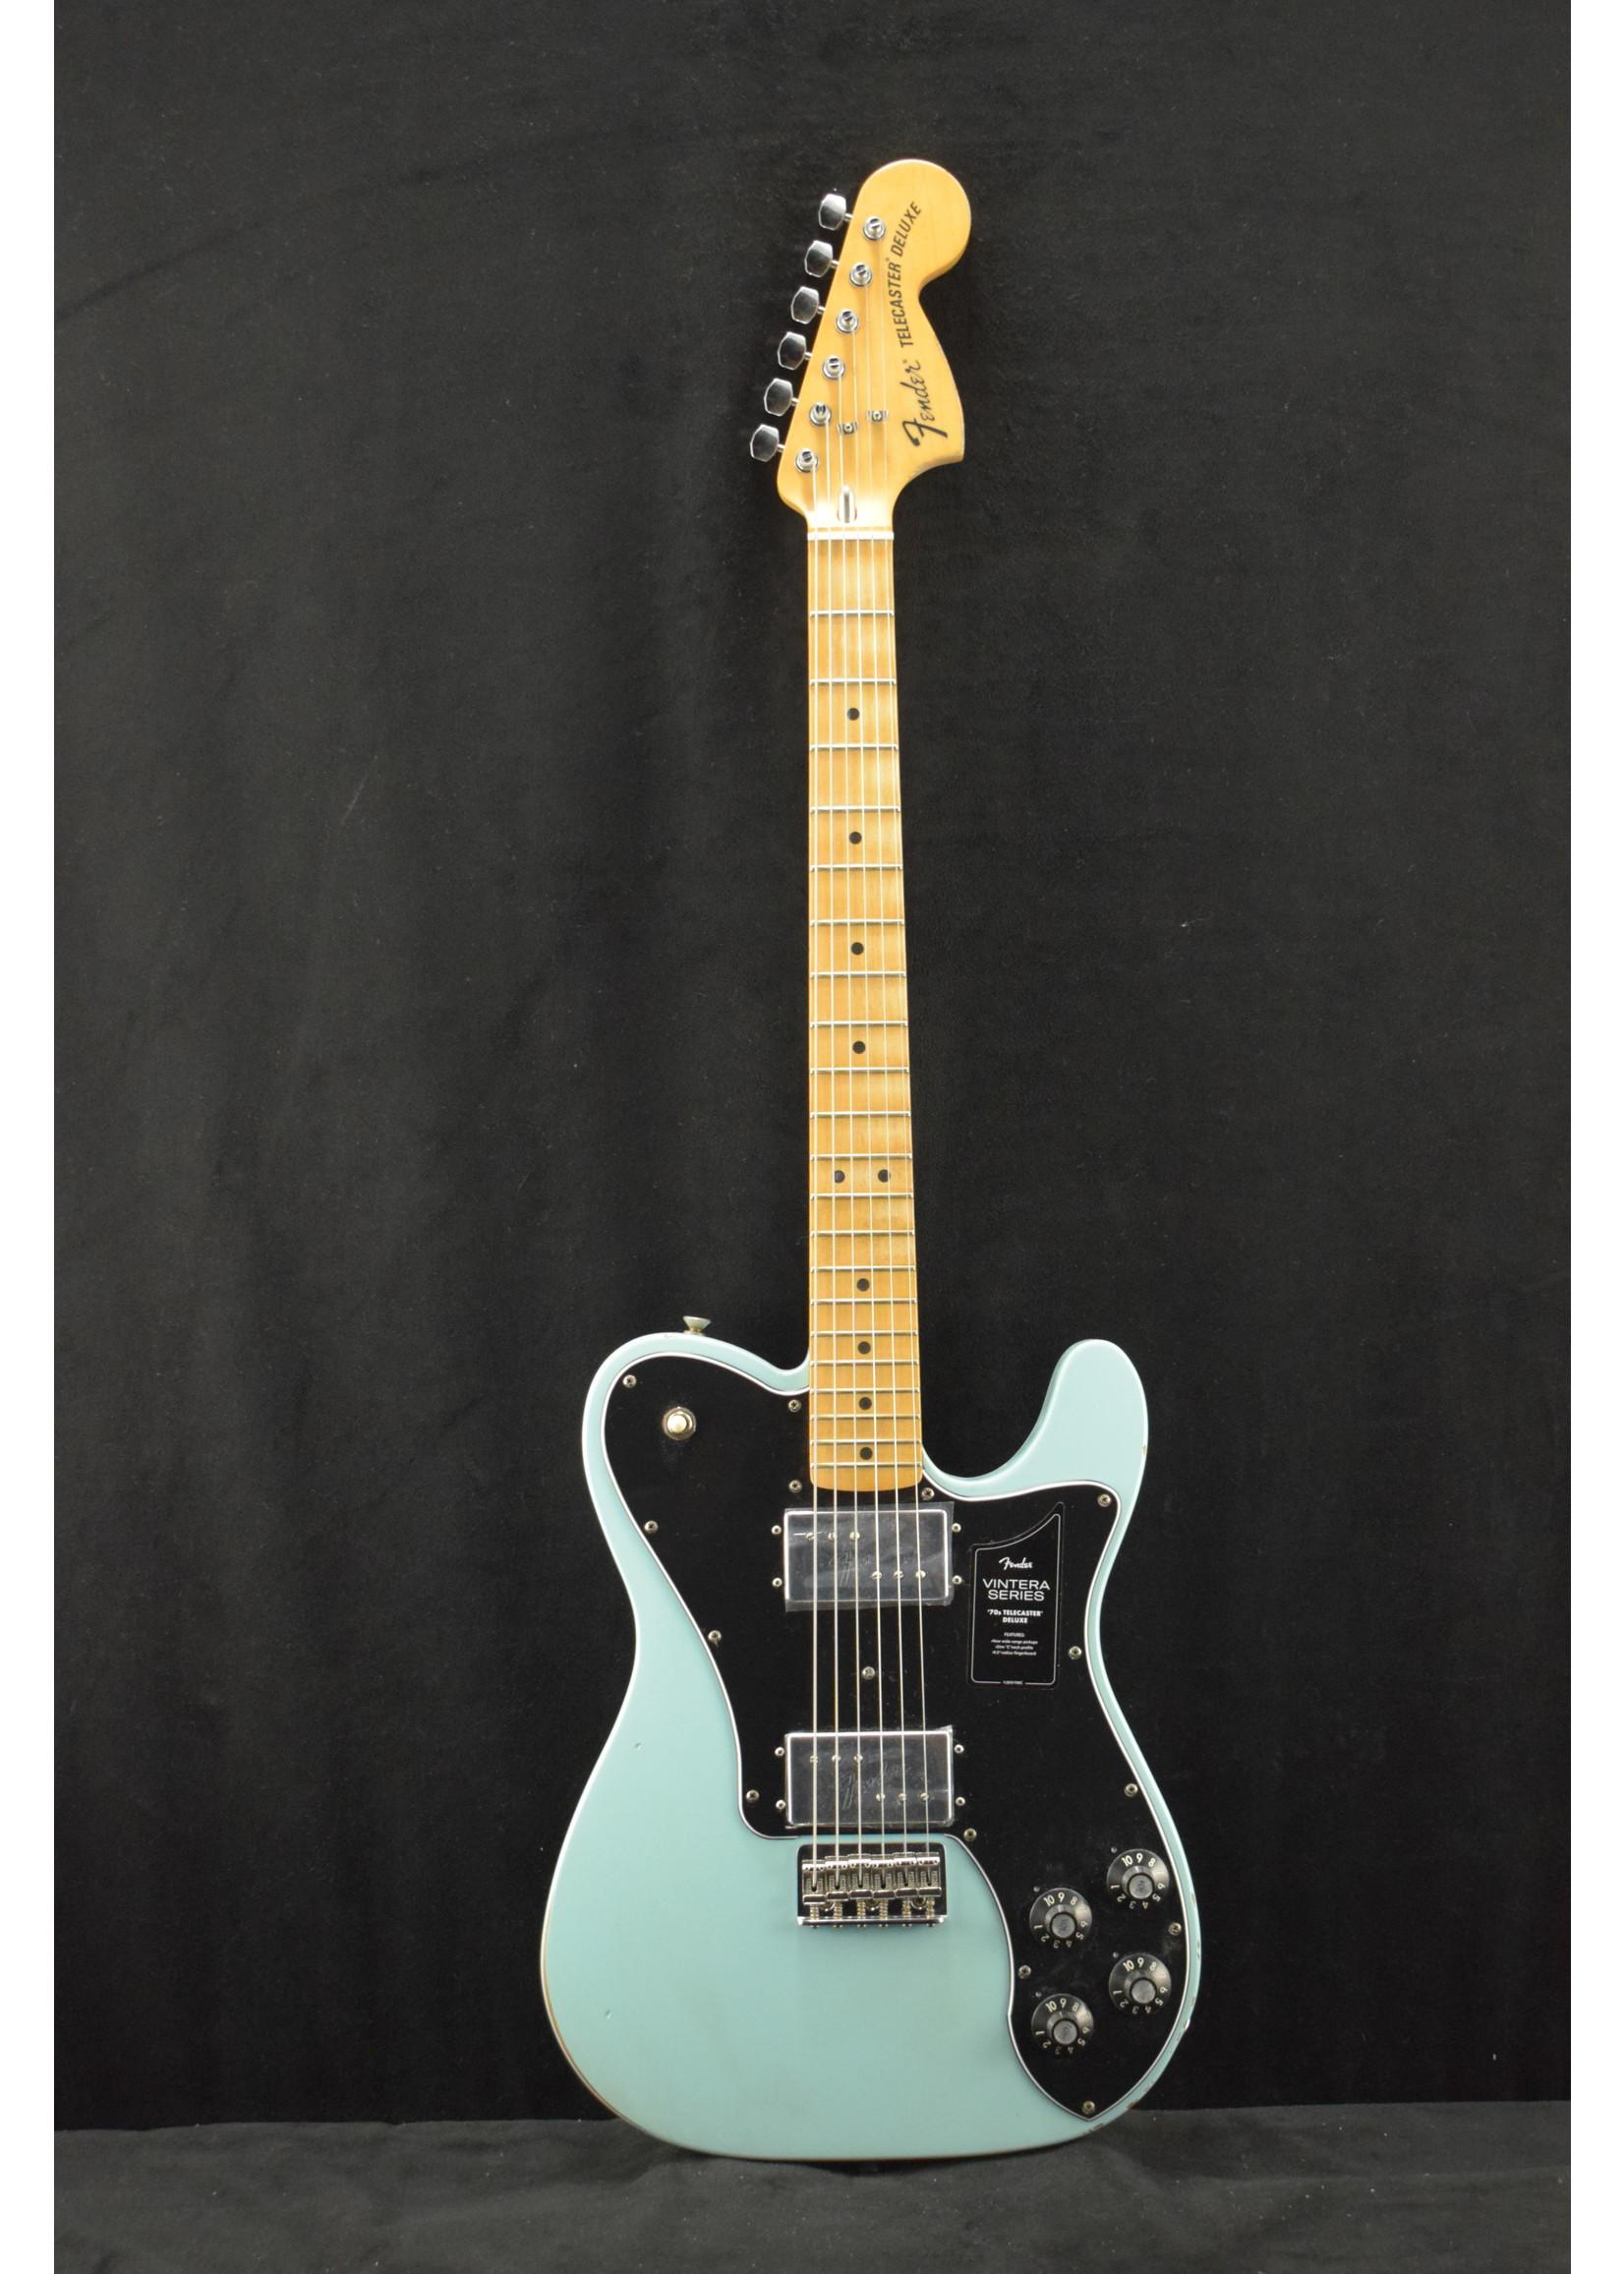 Fender Fender Vintera Road Worn '70s Telecaster Deluxe Daphne Blue